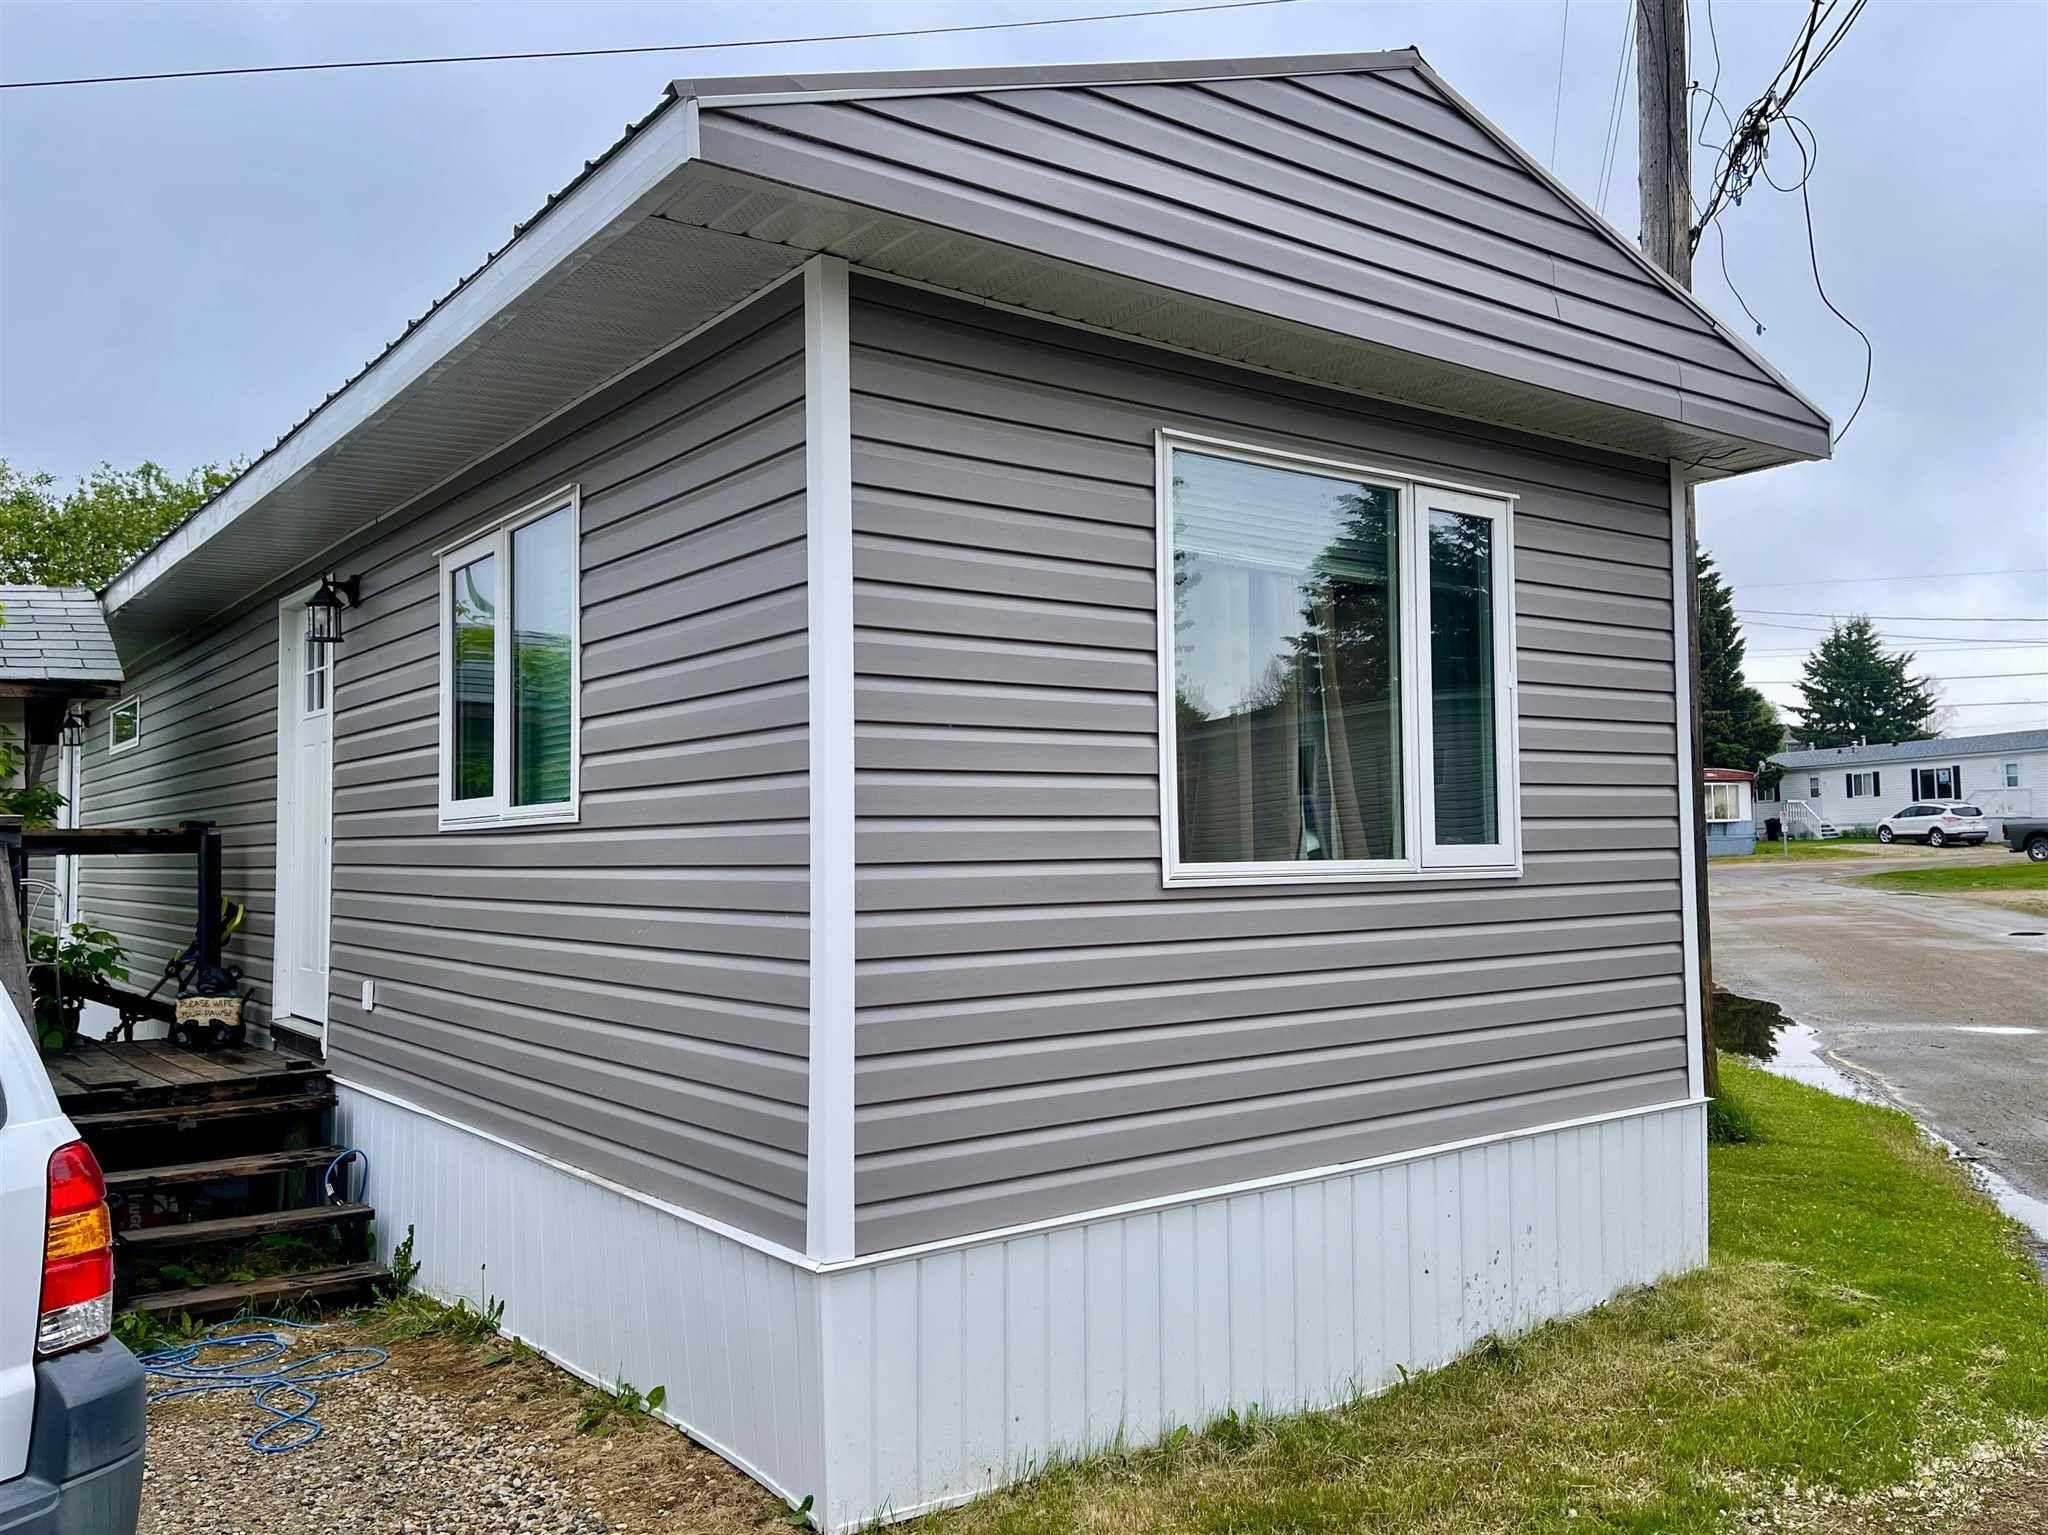 Main Photo: 179 305 Calahoo Road: Spruce Grove Mobile for sale : MLS®# E4248577